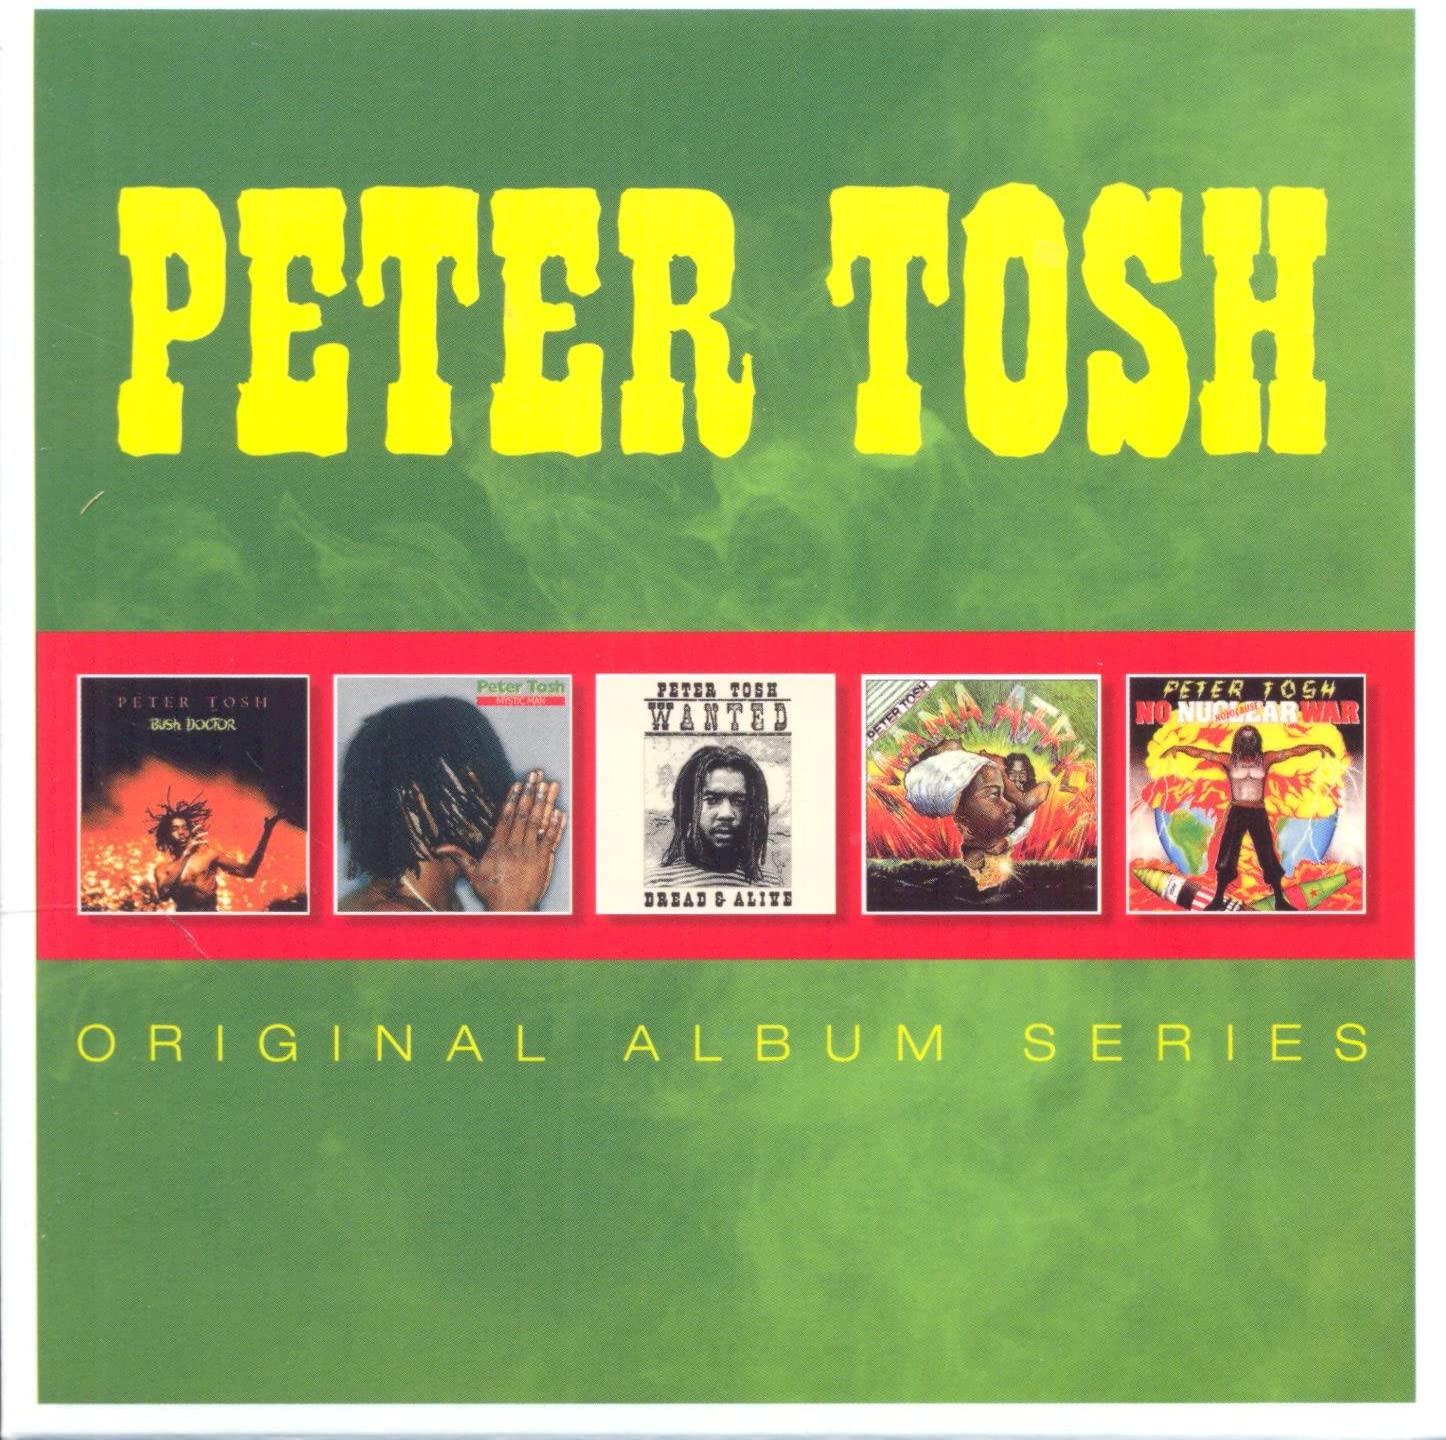 Peter Tosh - Original Album Series (5 CD Box Set with FREE MP3 of the albums) £6.99 + 99p NP @ Amazon